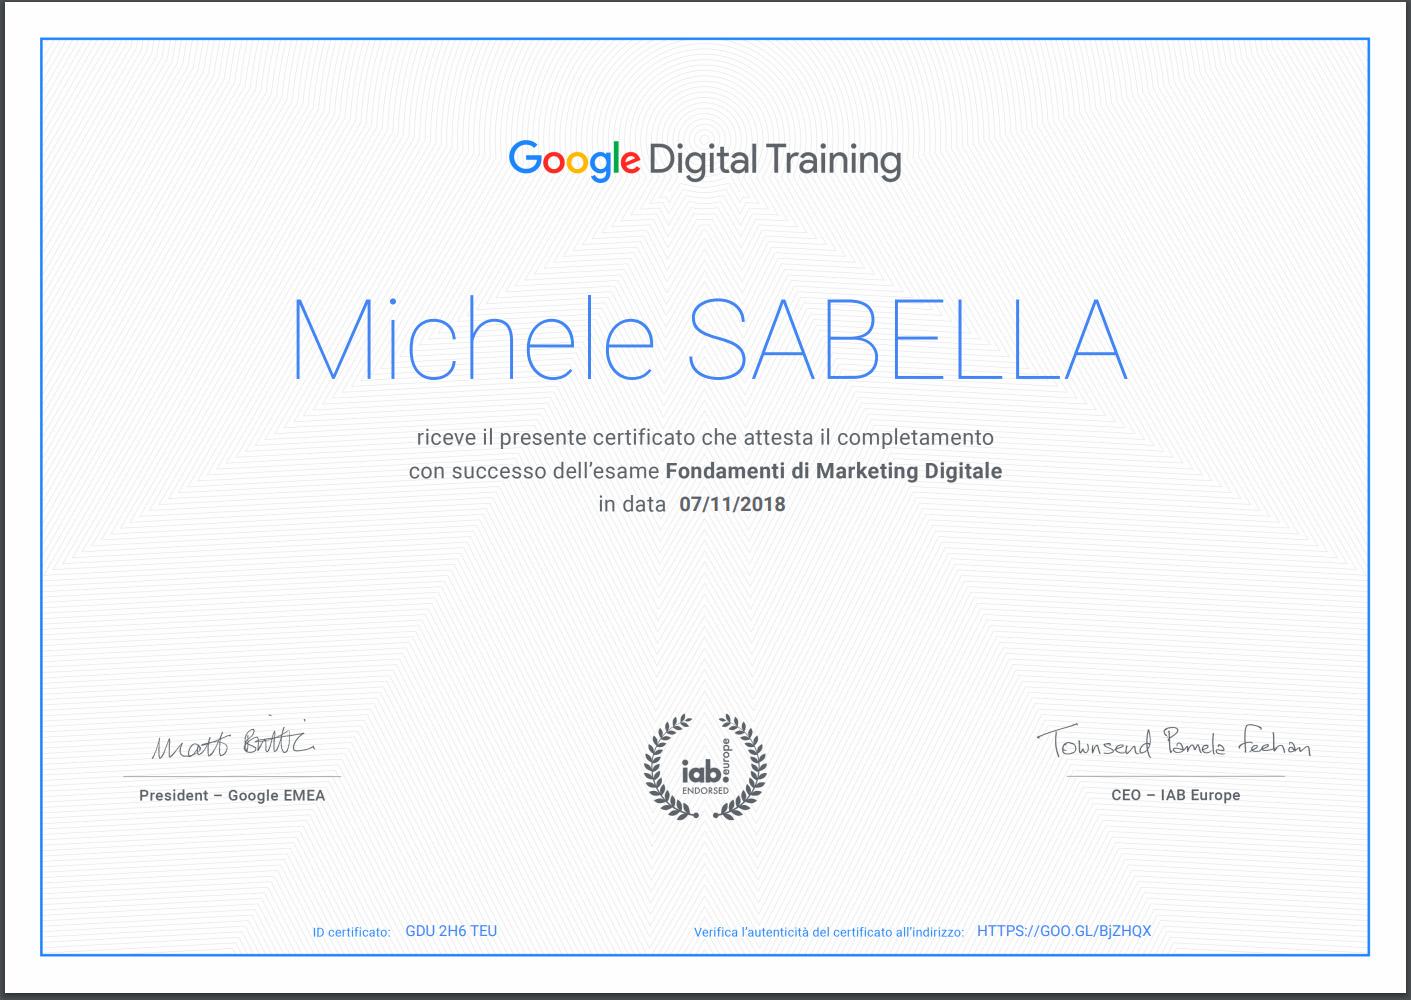 Attestato Google Digital Training Michele Sabella